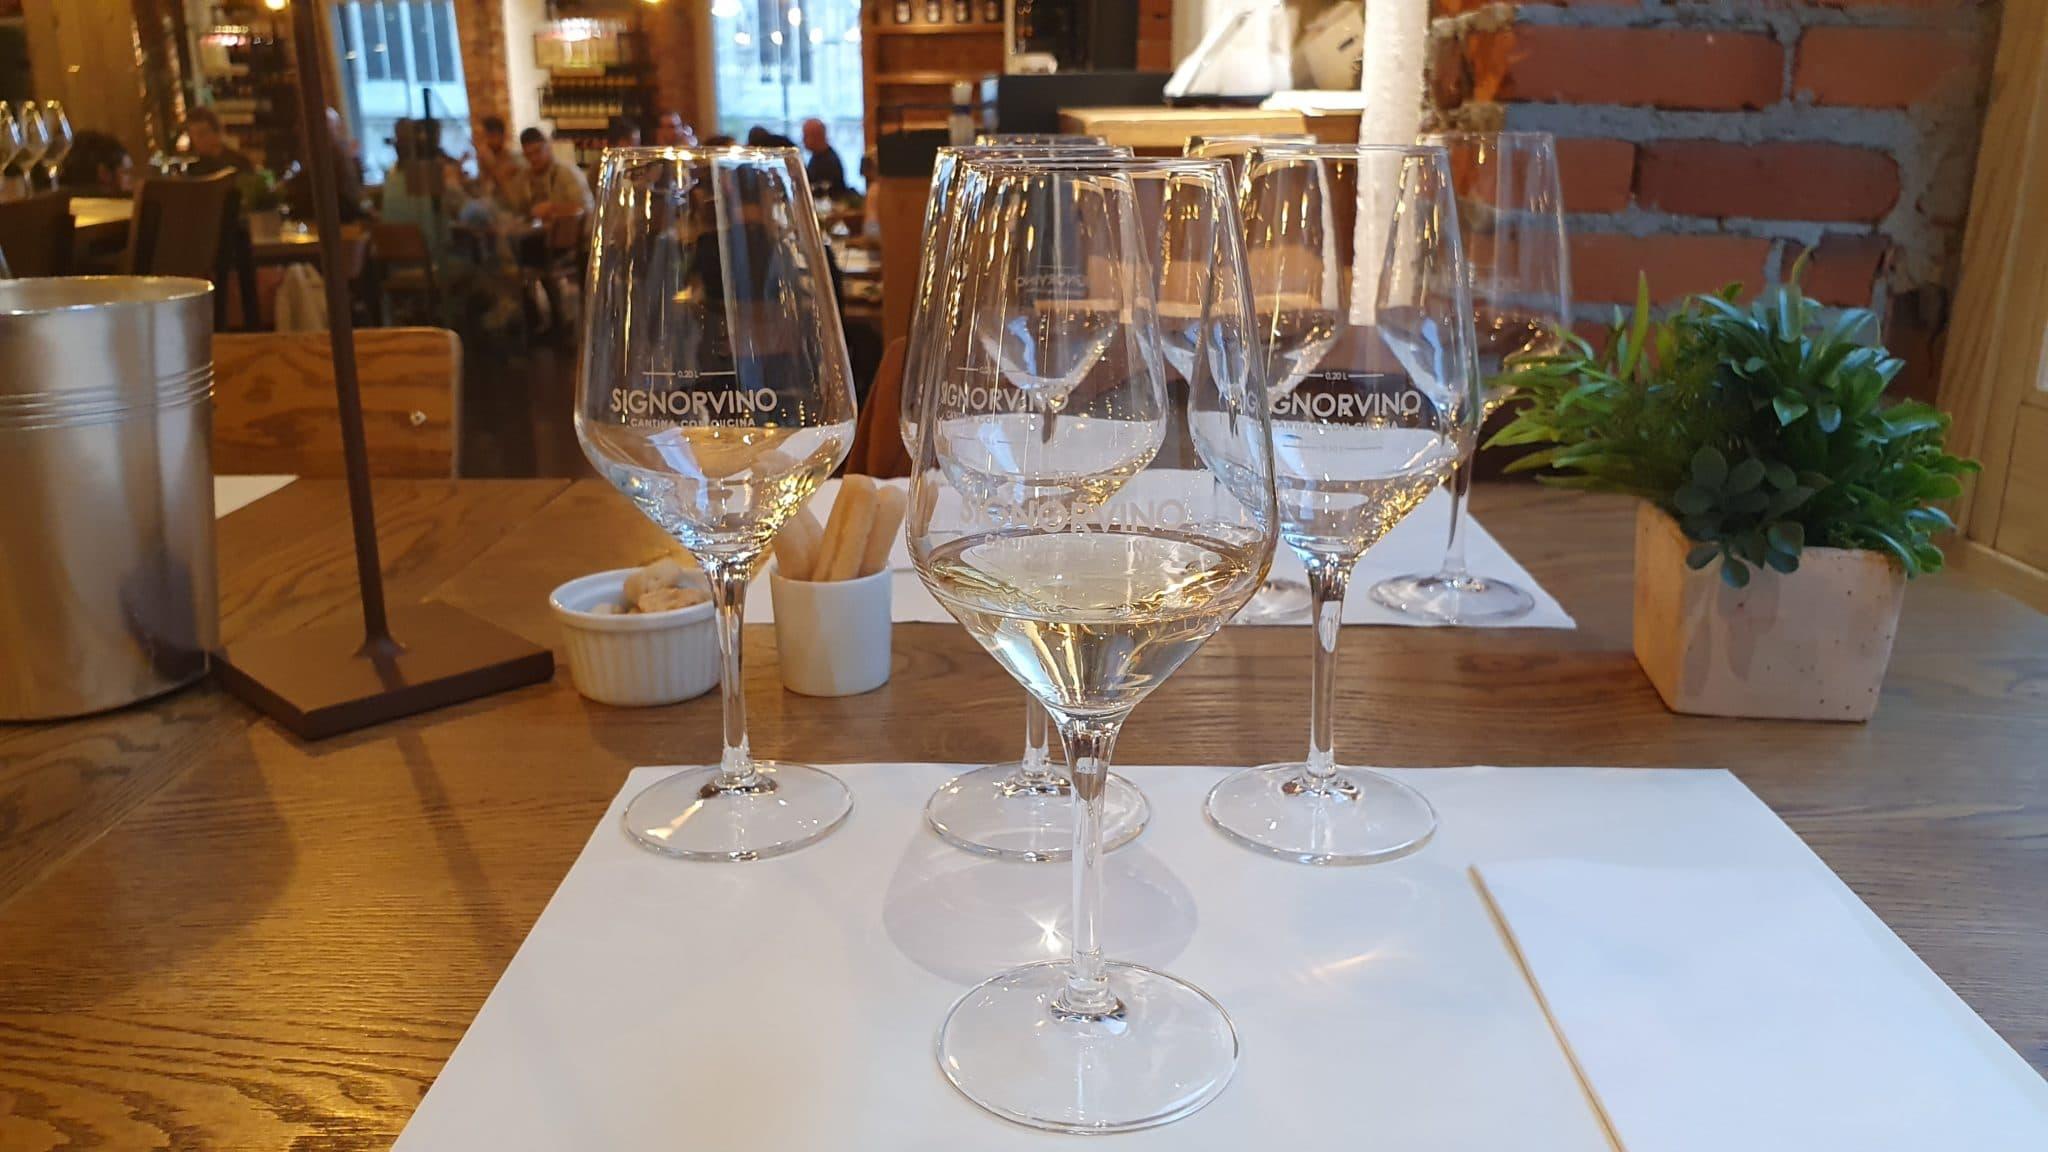 degustazione-cieca-signorvino-wine-week